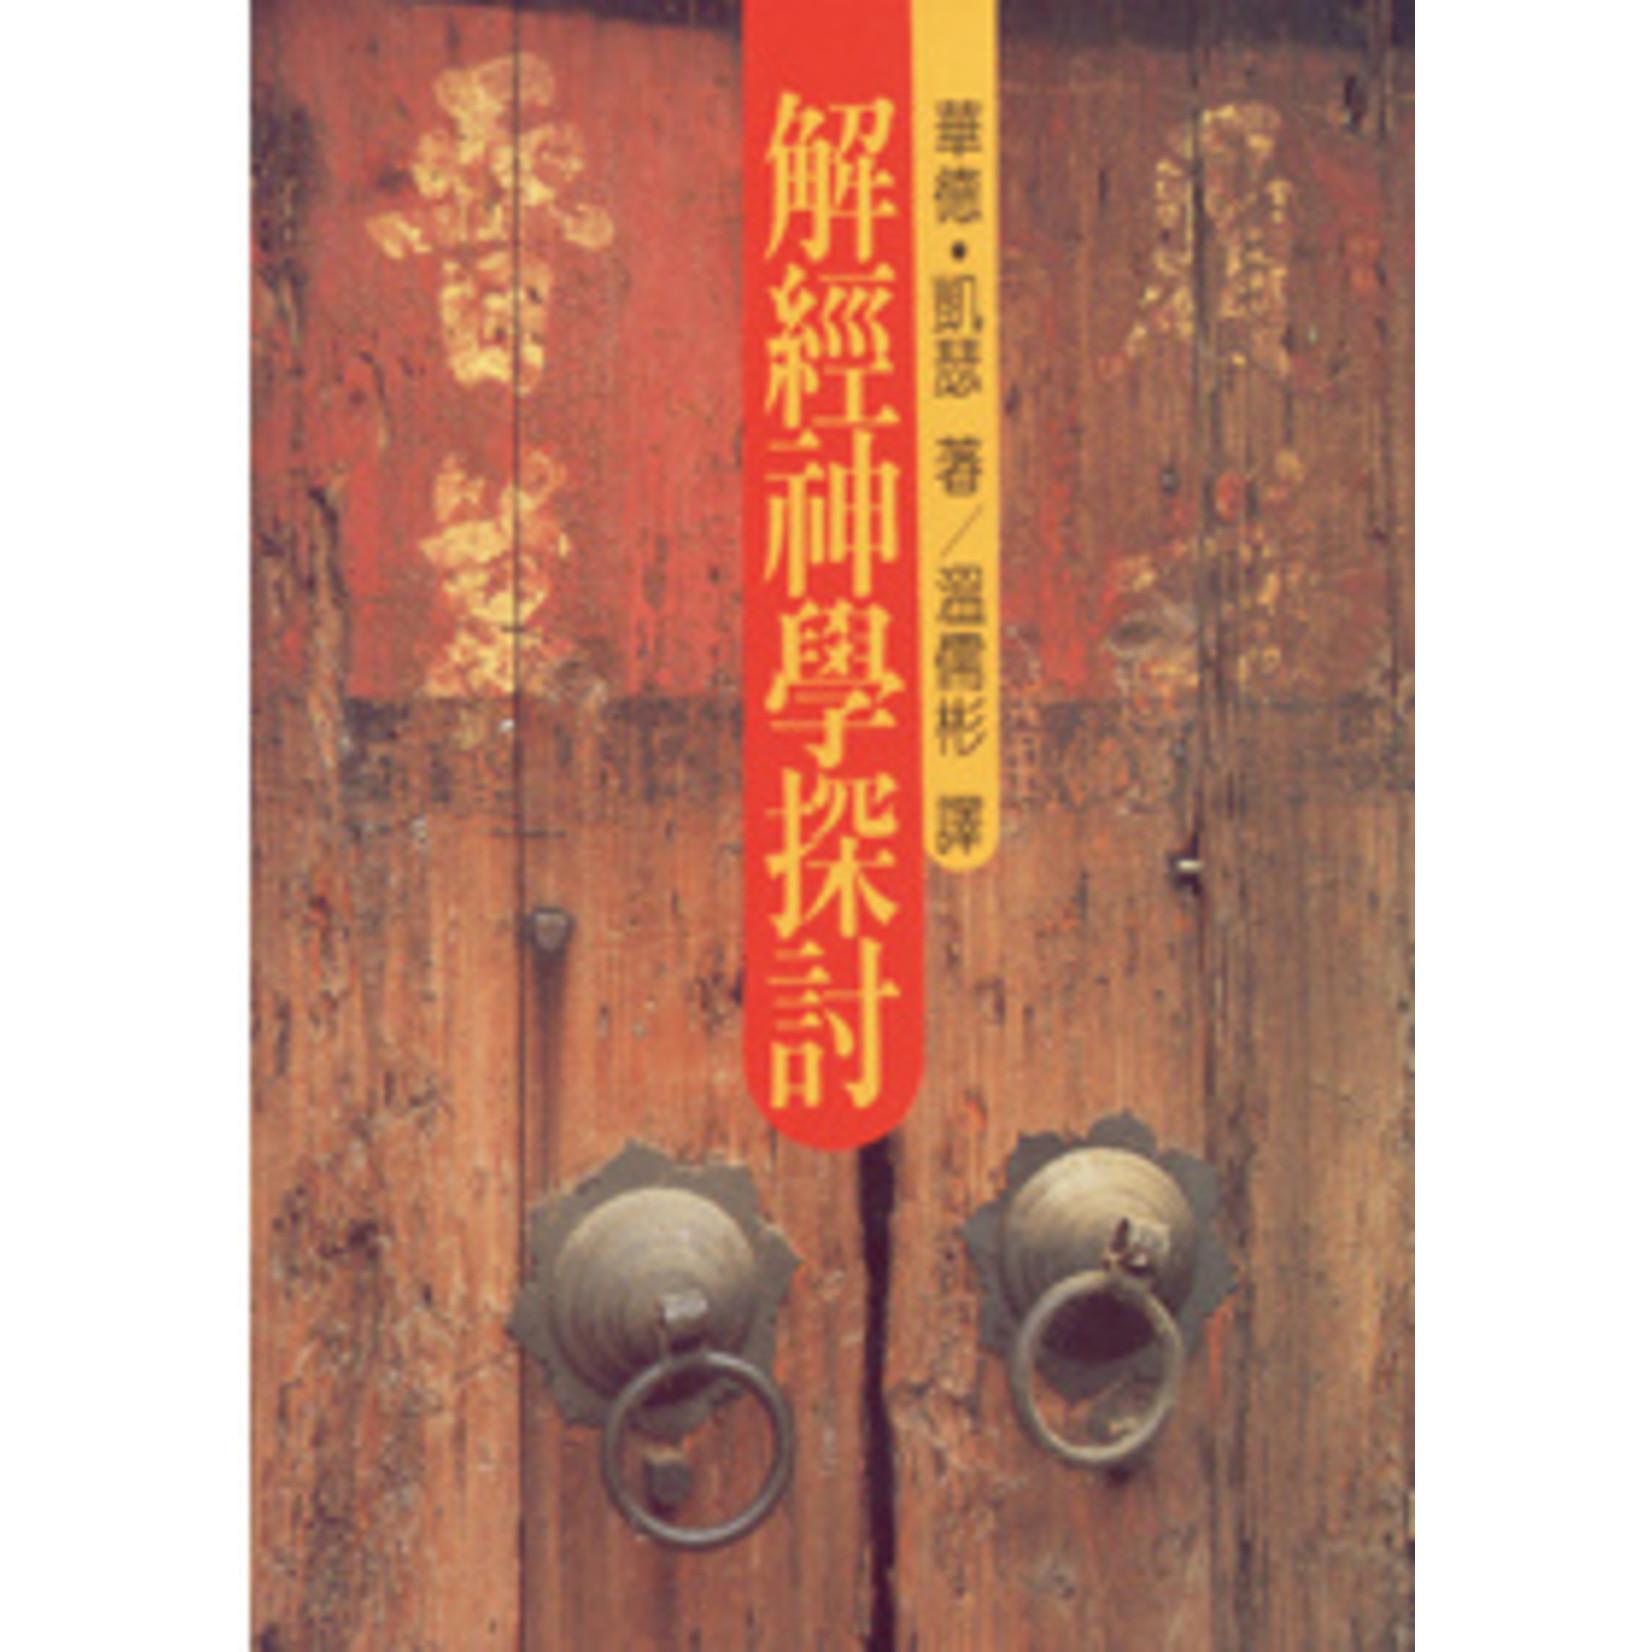 中華福音神學院 China Evangelical Seminary 解經神學探討 Toward an Exegetical Theology